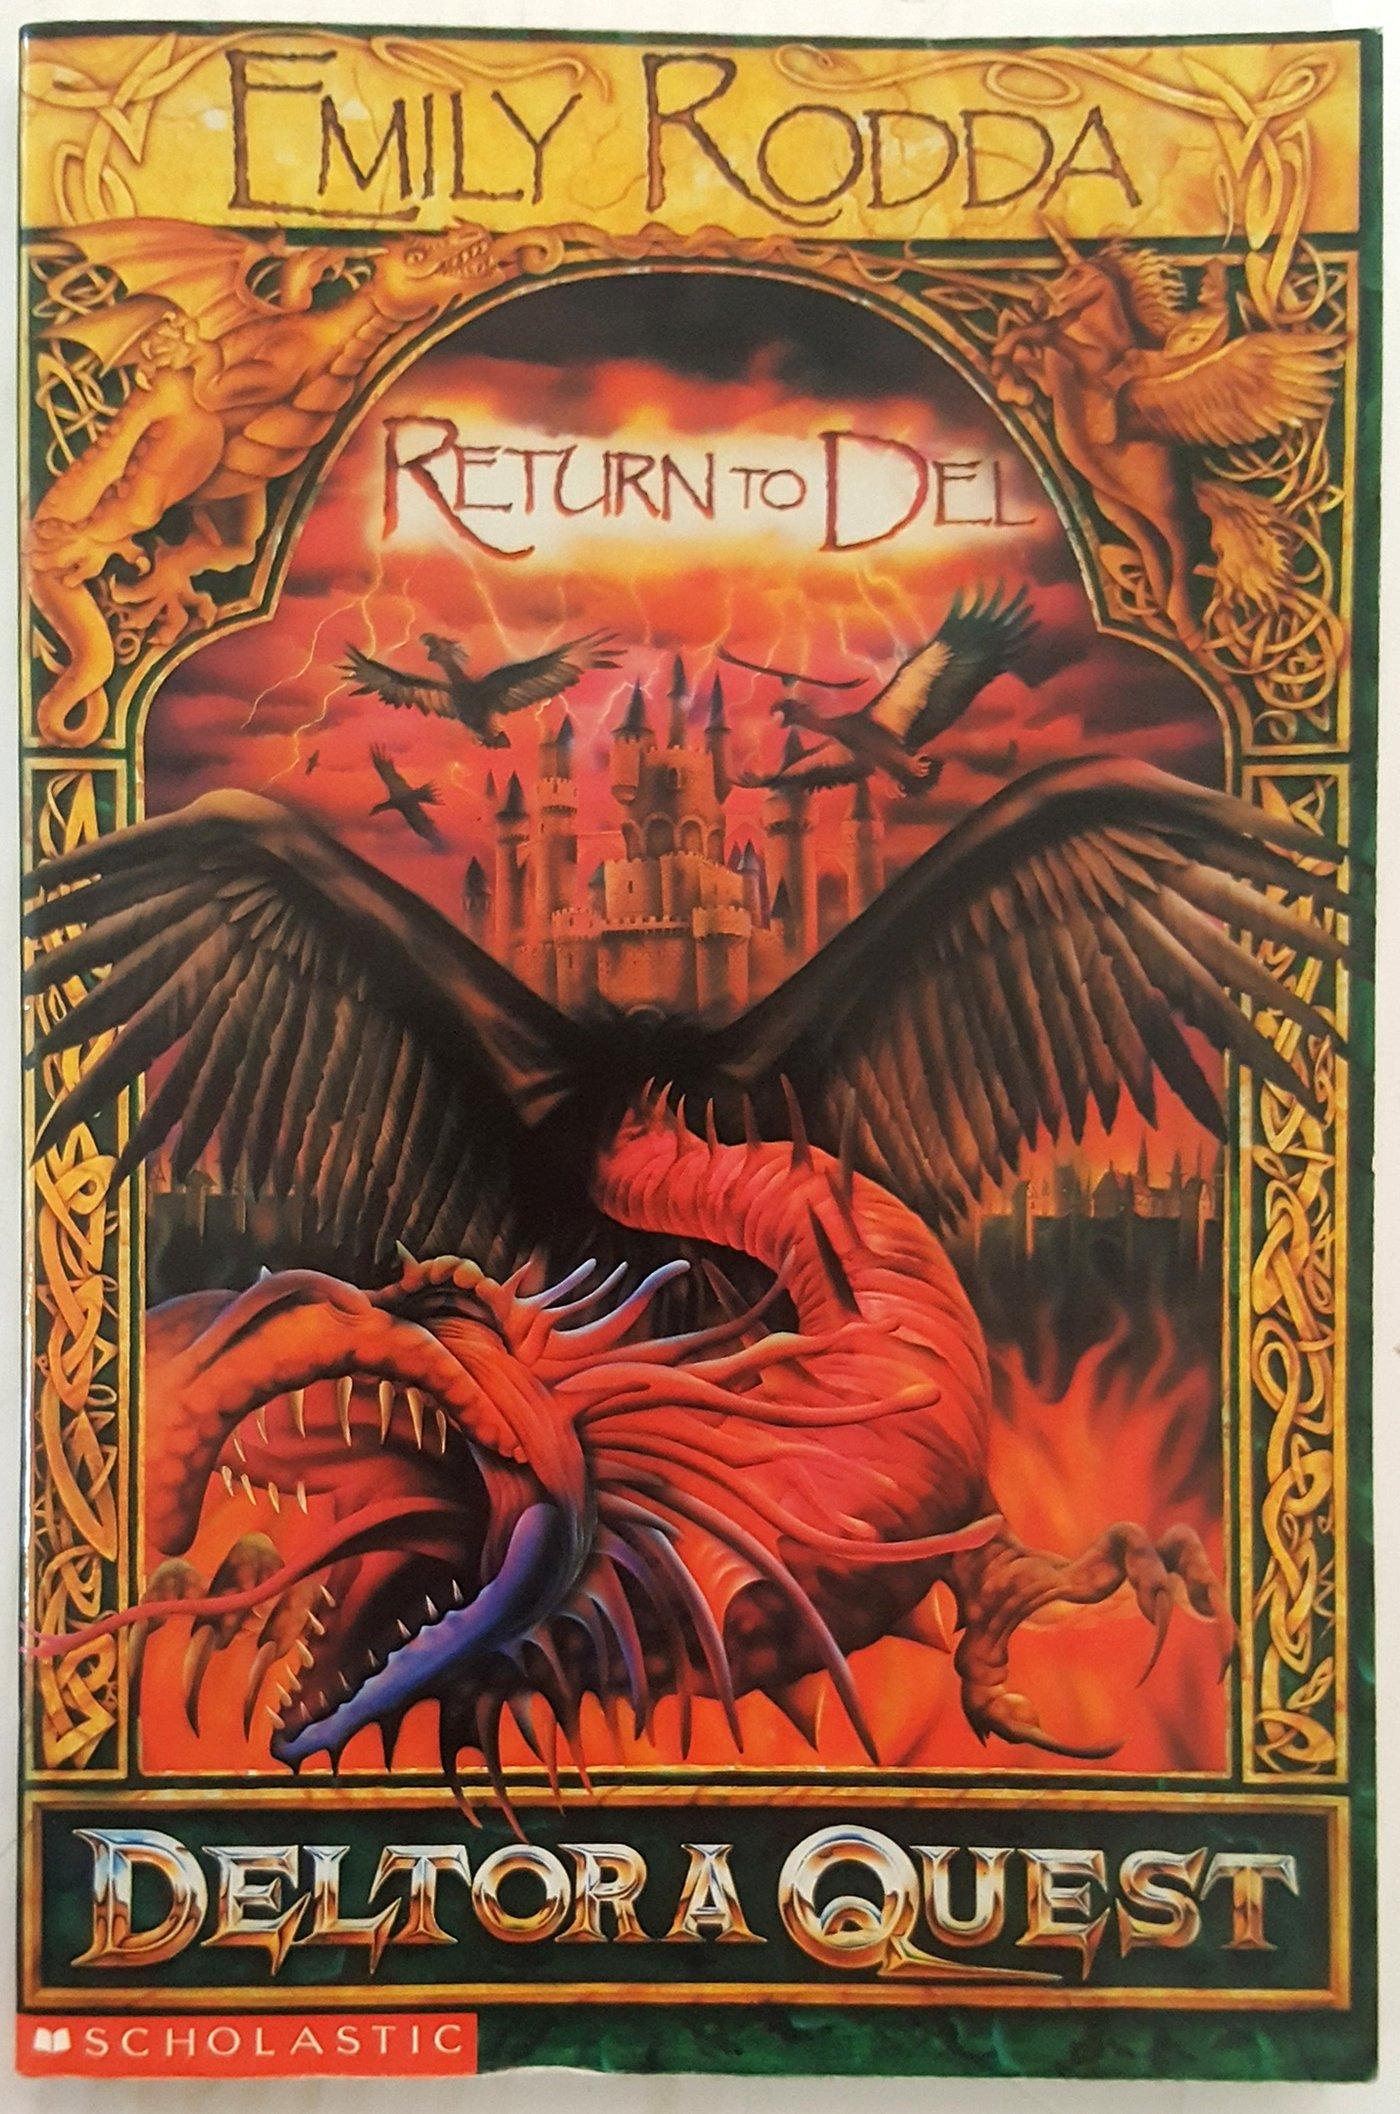 Return To Del Deltora Quest Wiki Fandom Powered By Wikia